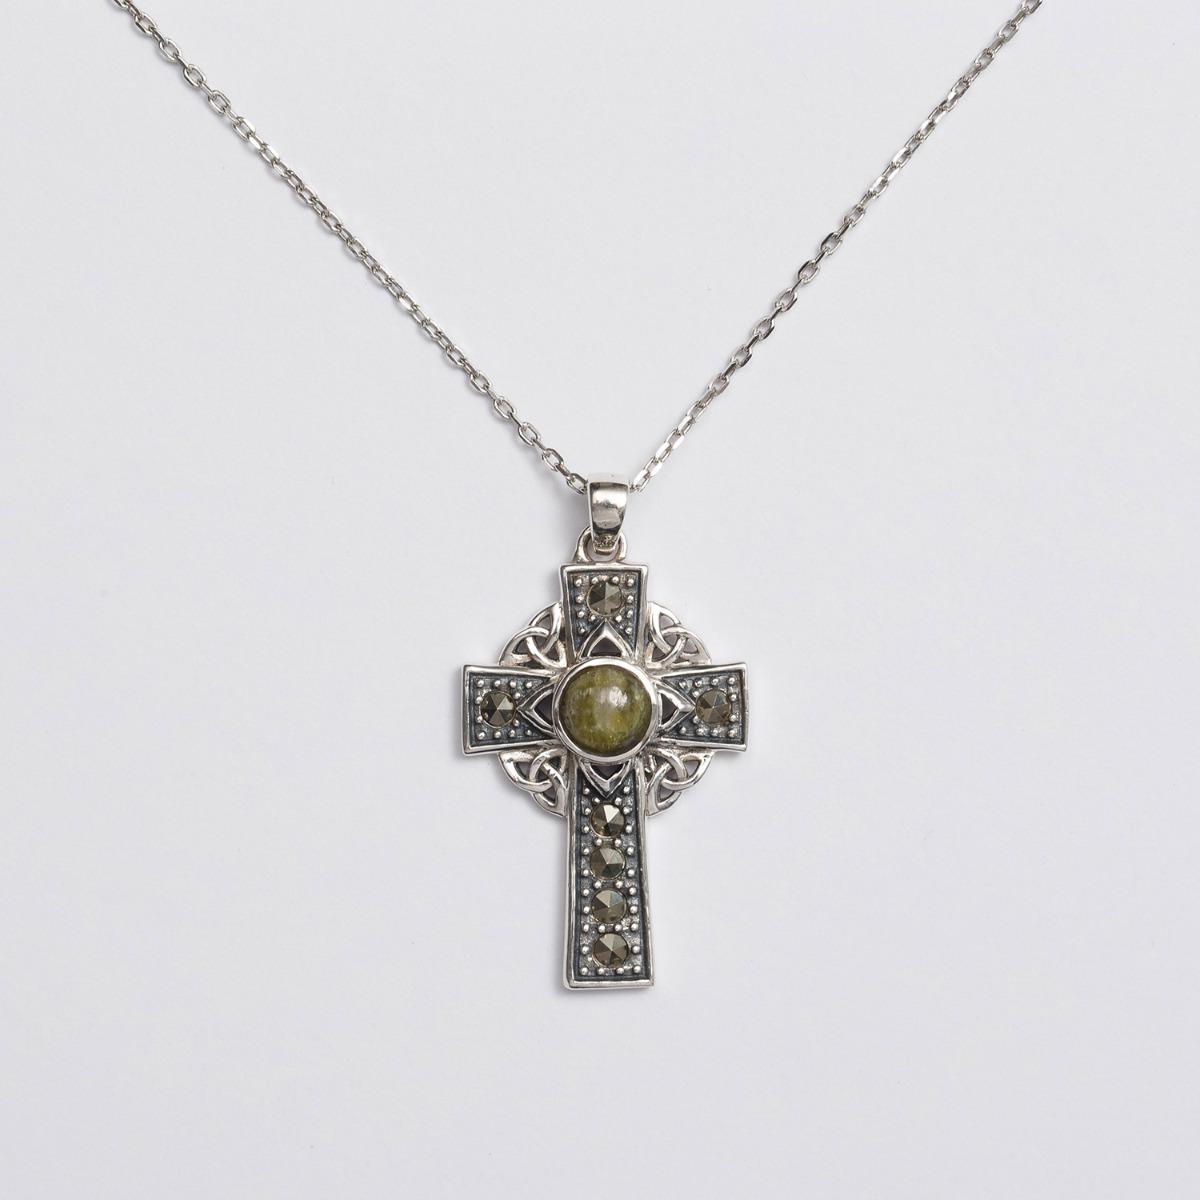 celtic cross pendant.Celtic jewelry gifts